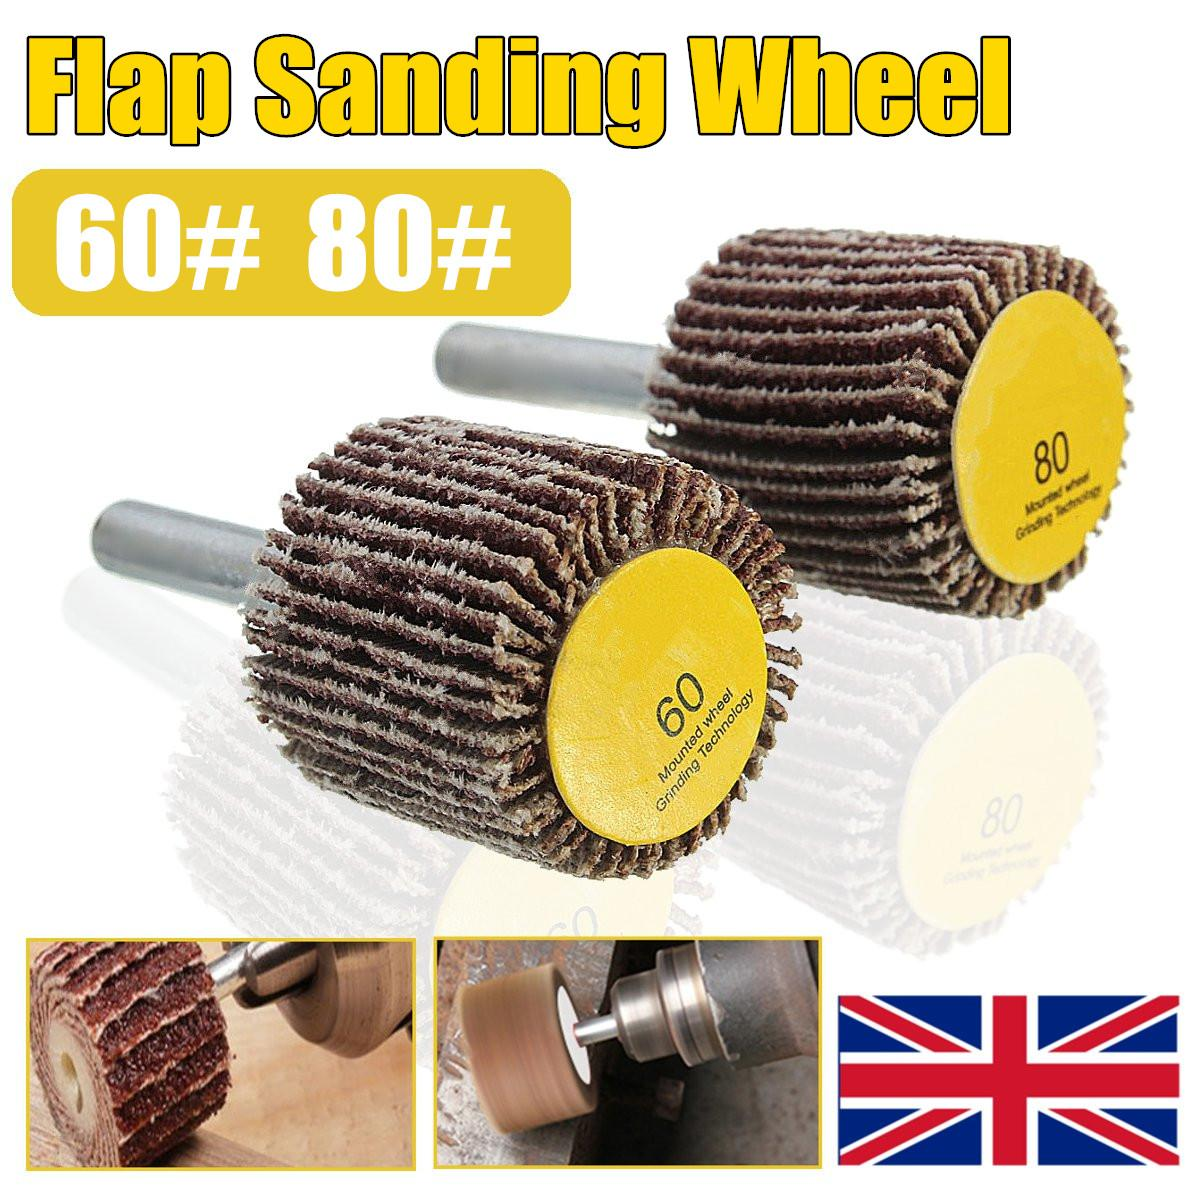 6mm Shank Sandpaper Grinding Wheel 60/80 Grit For Dremel Accessory Rotary Tool